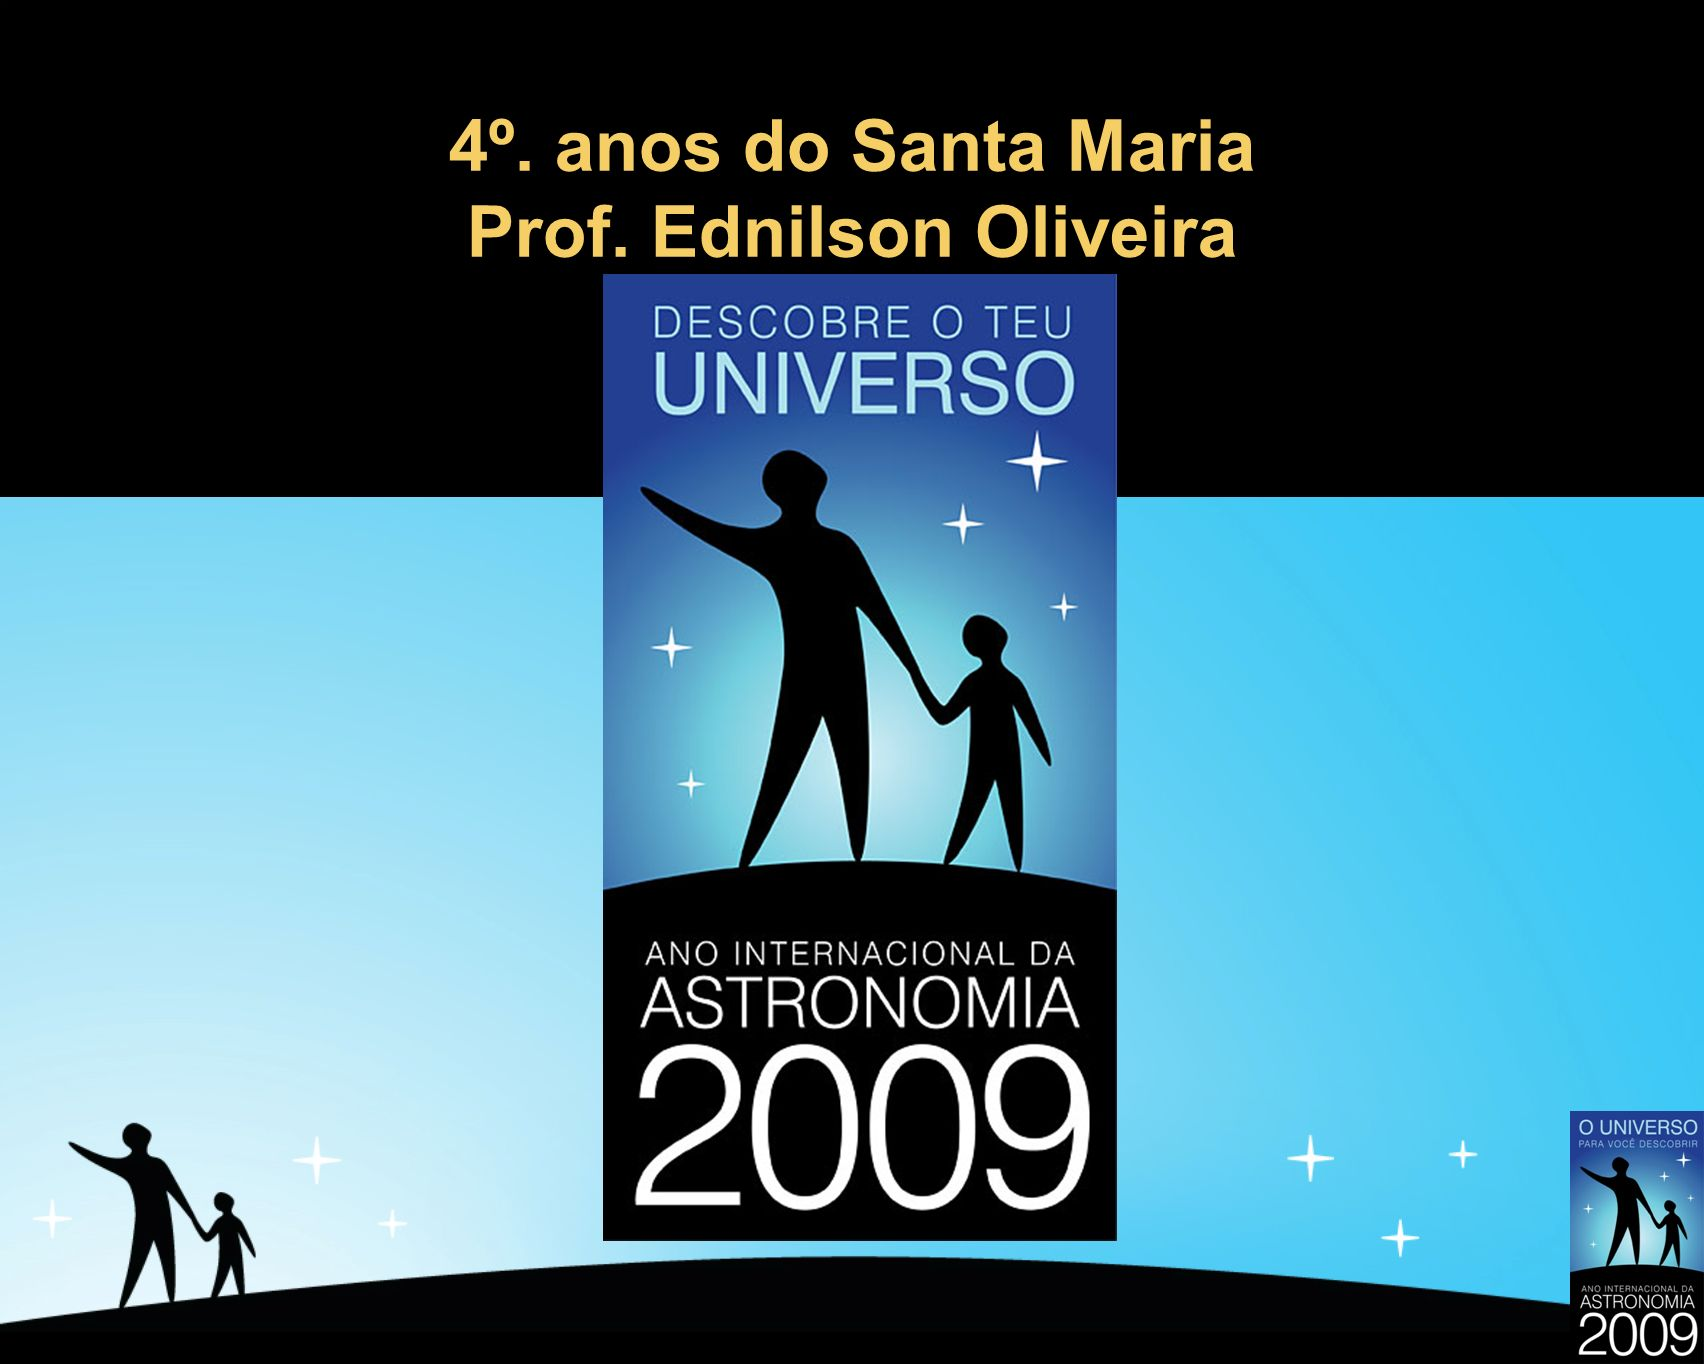 Prof. Ednilson Oliveira